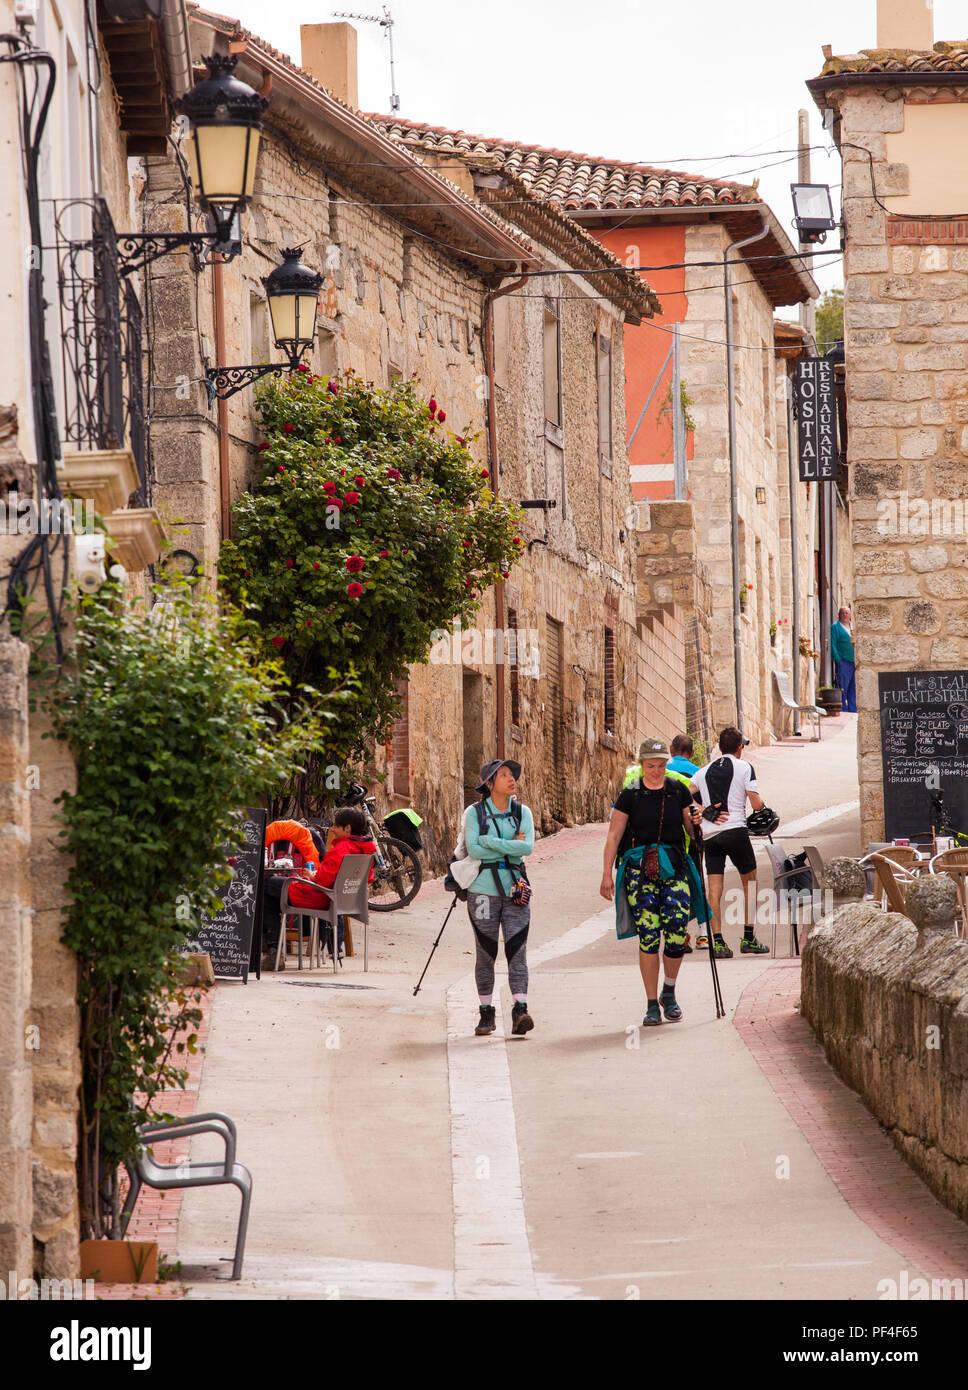 Pilgrims men and women walking on the way of St James the Camino de Santiago in the village of Hontanas Burgo Castille y Leon Spain - Stock Image